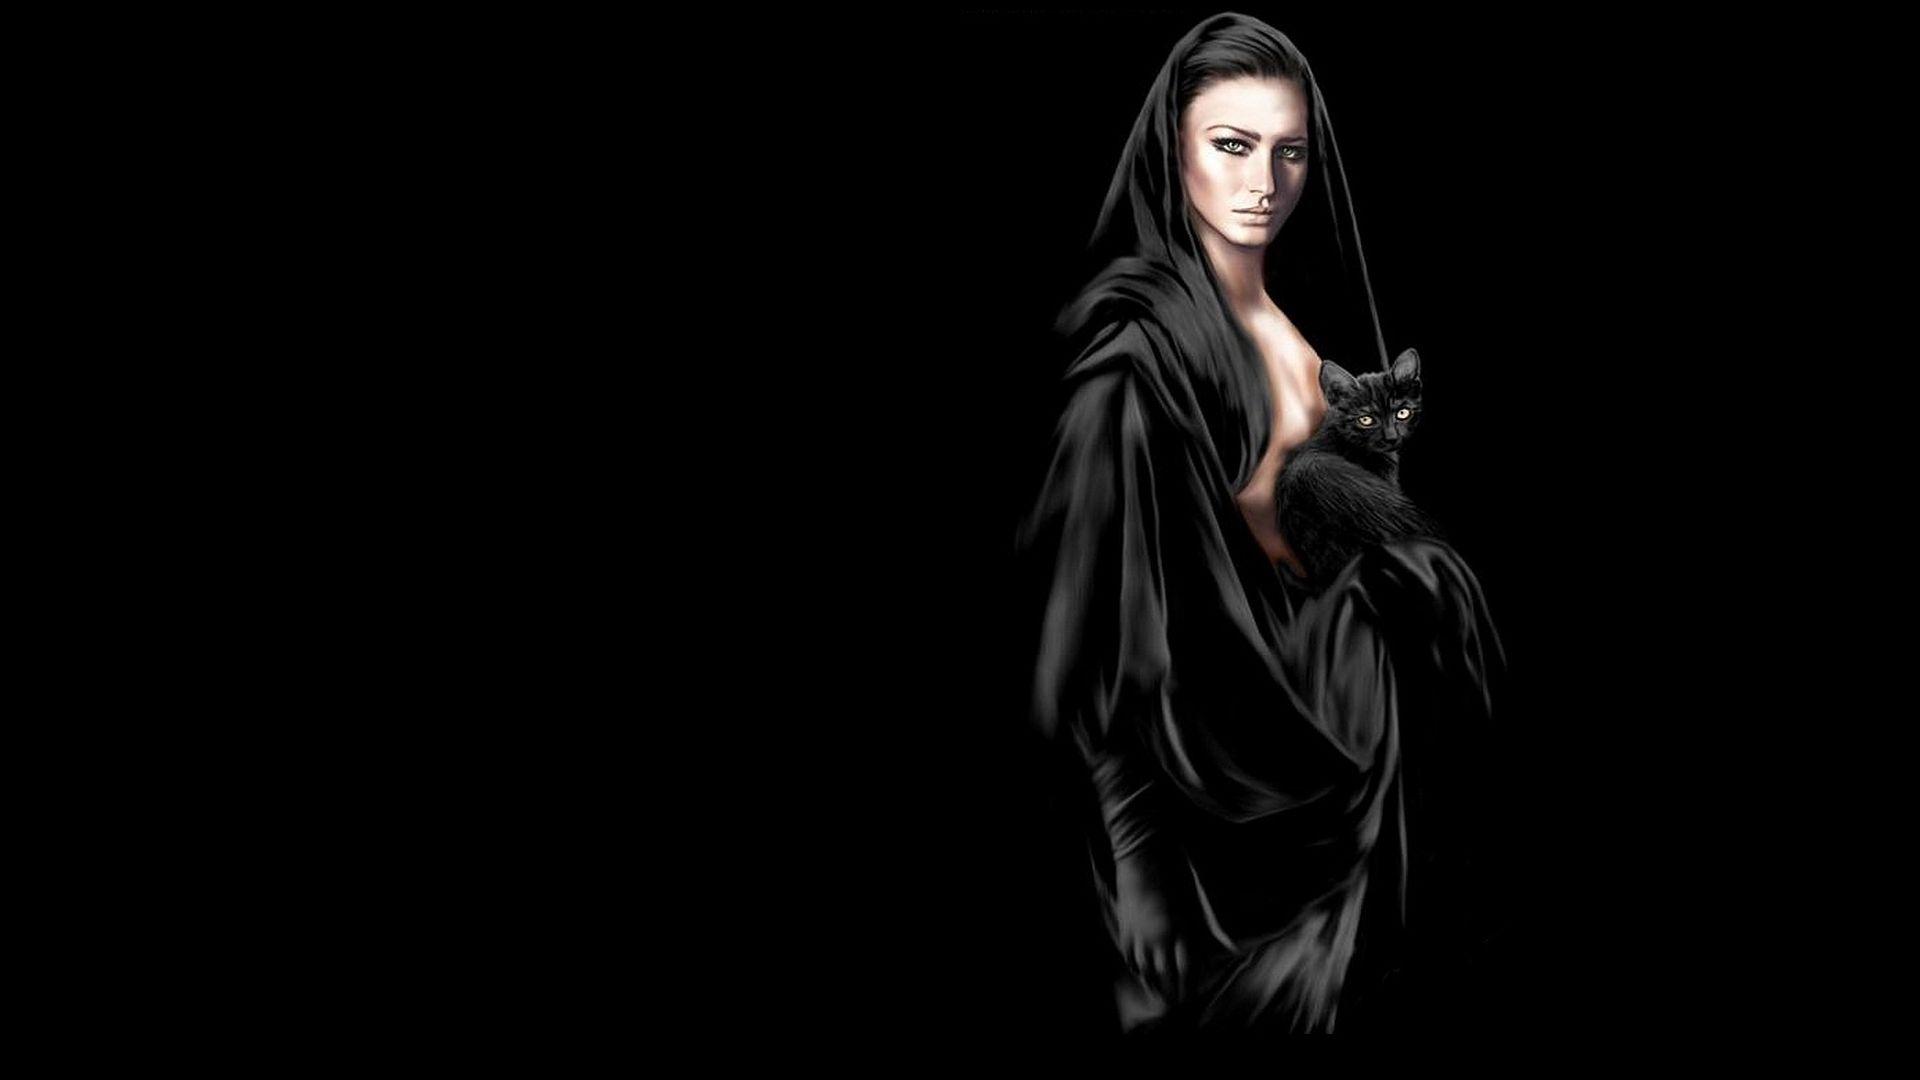 pin 3d black cat - photo #32